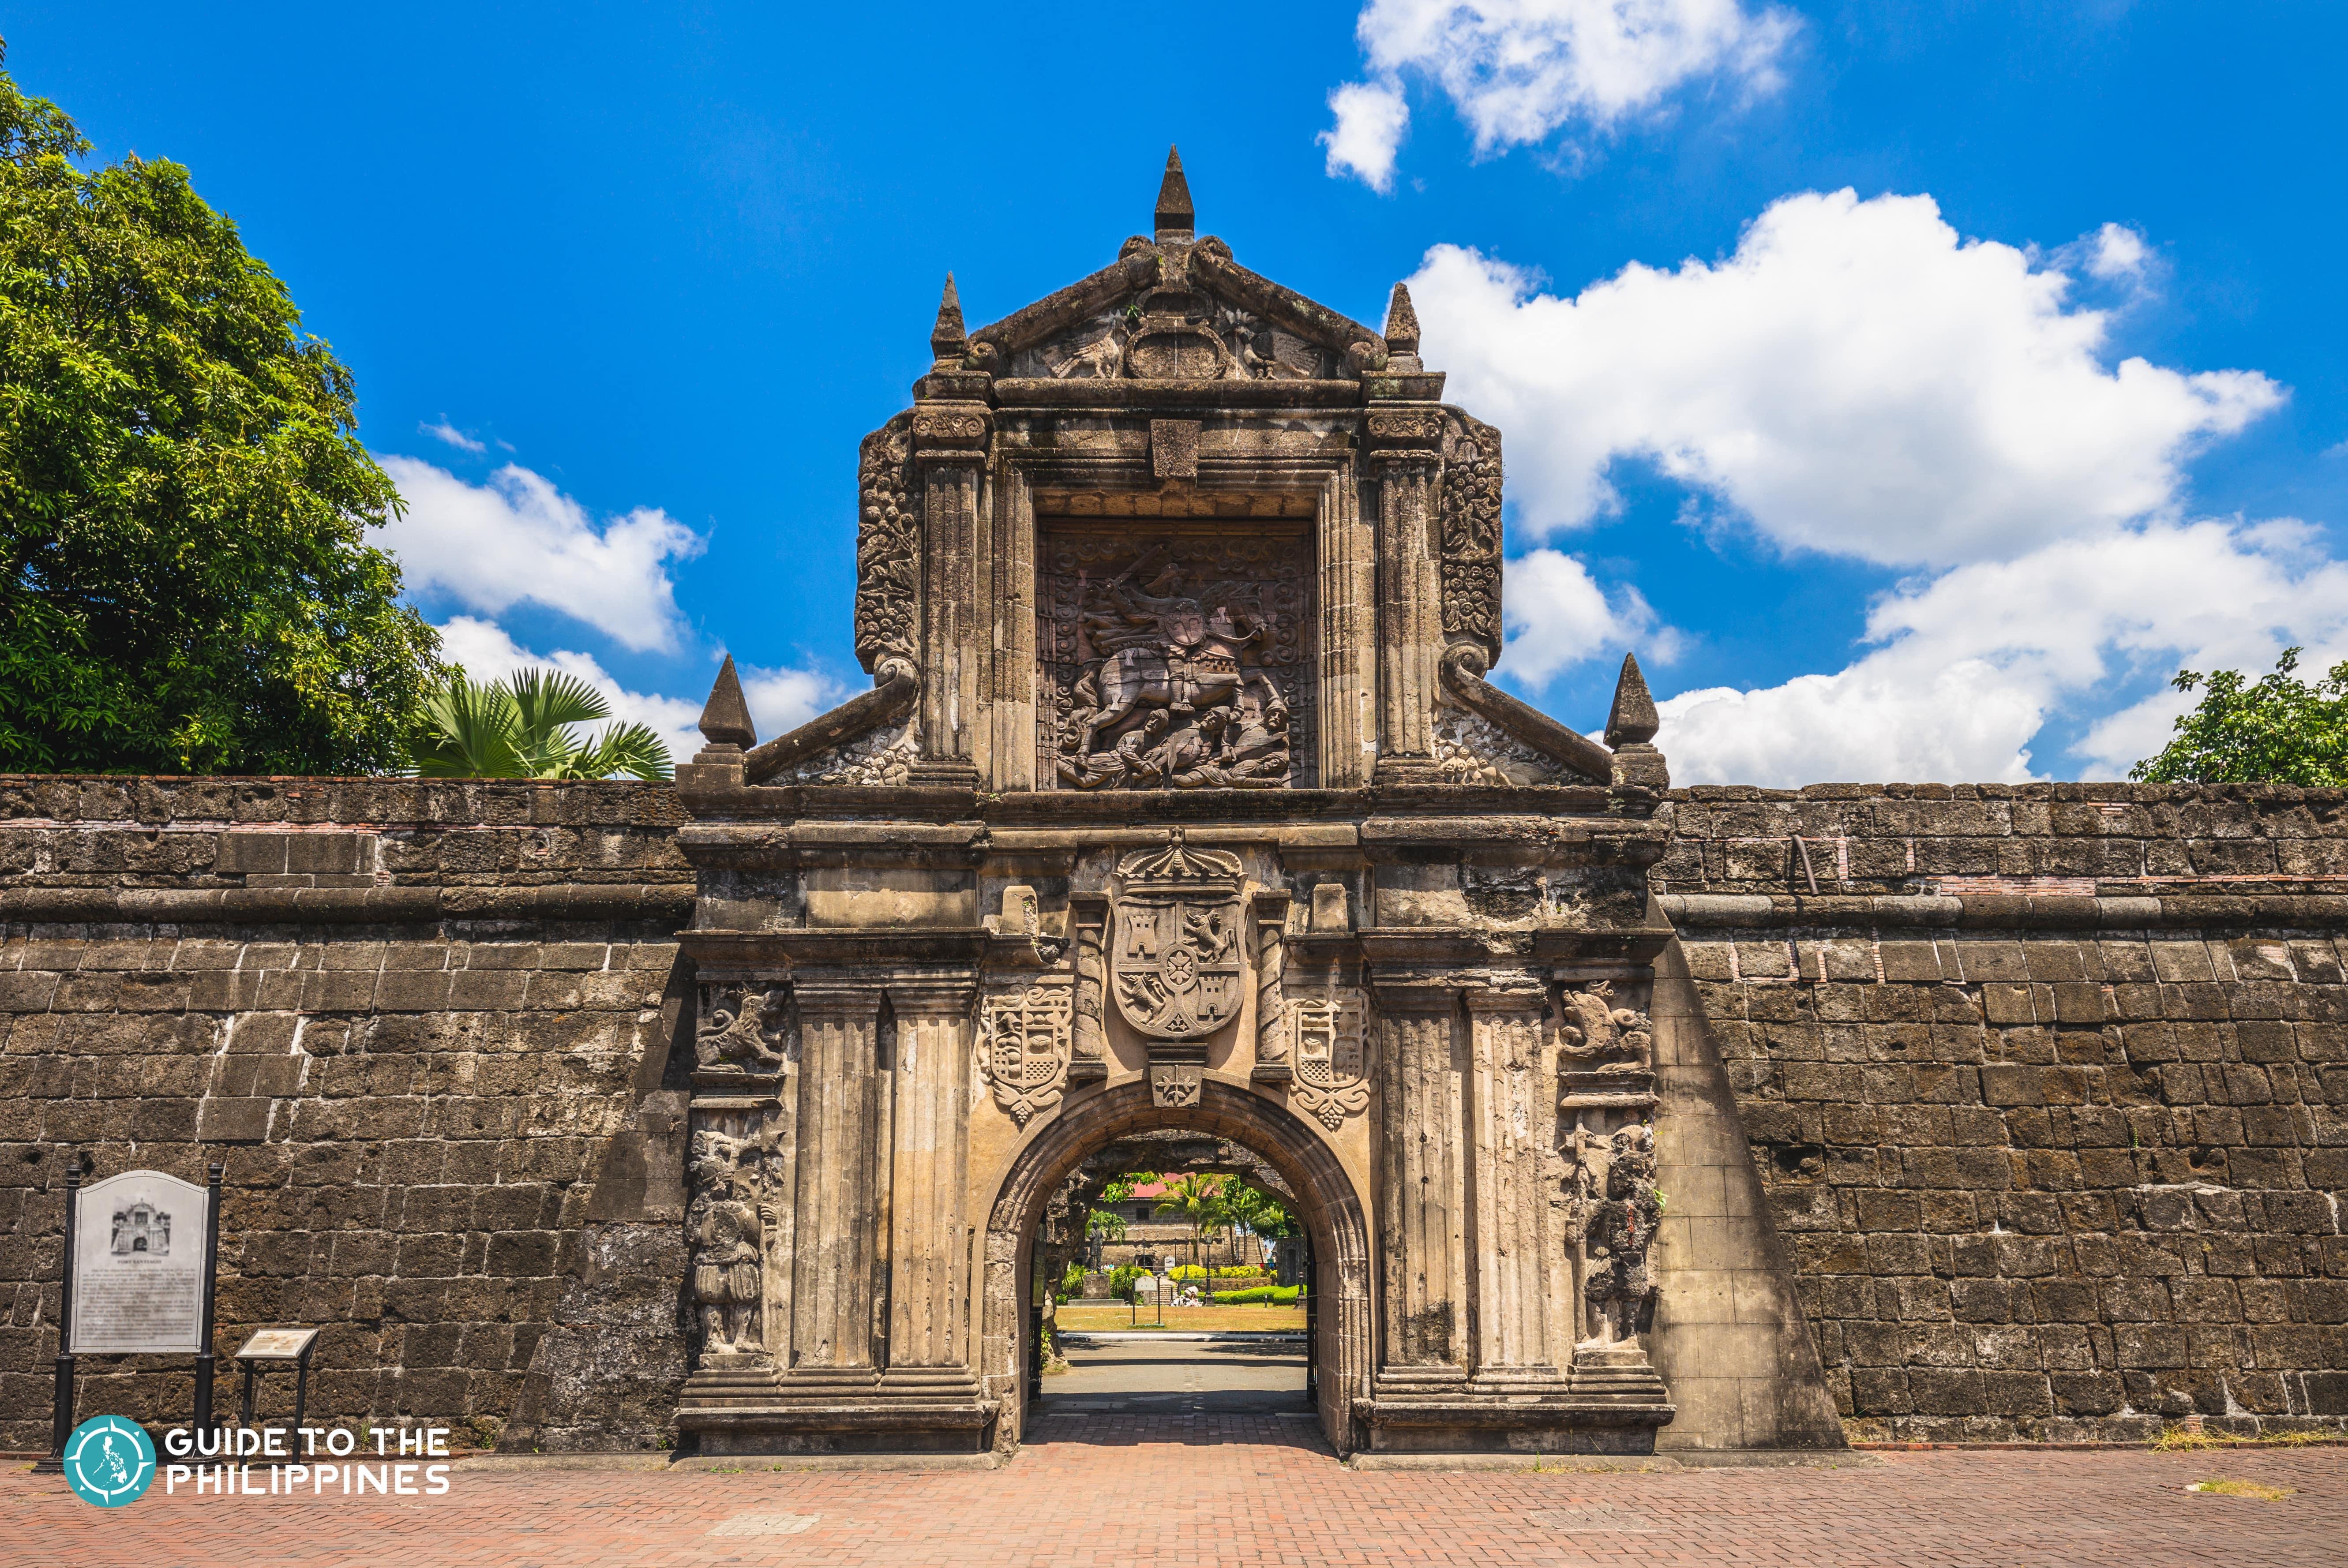 Facade of Fort Santiago inside Intramuros